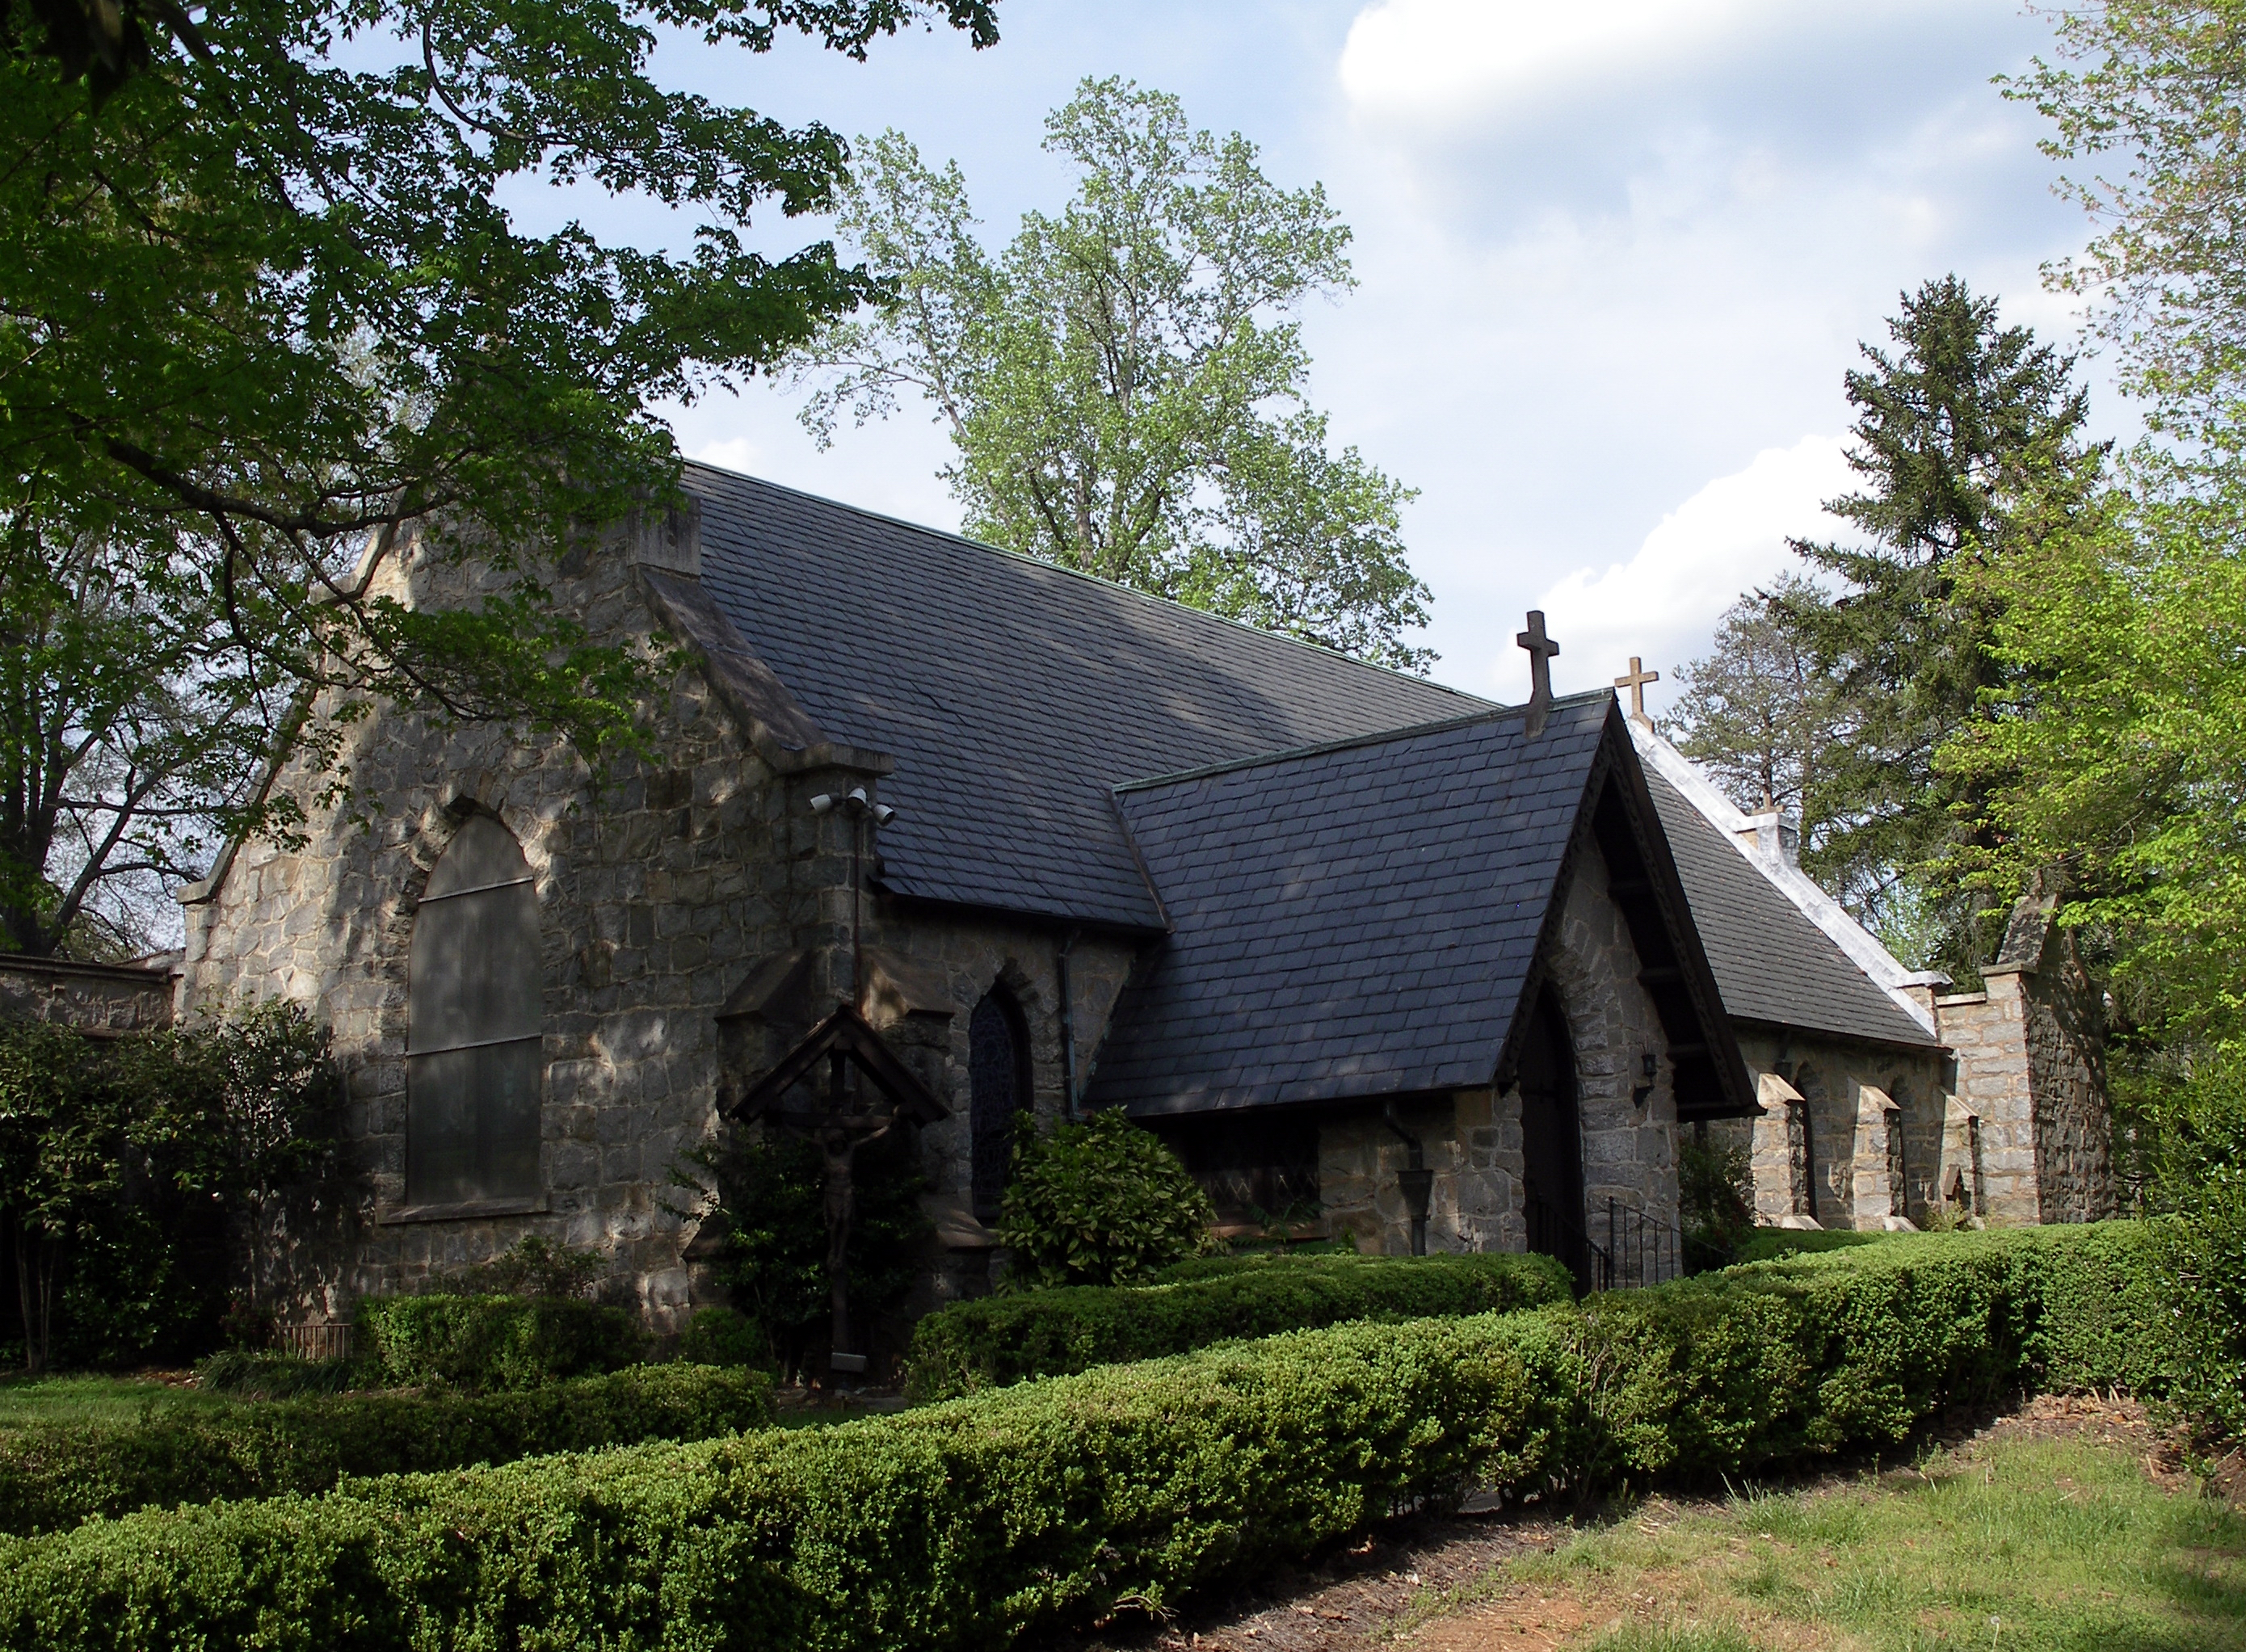 St. Francis Historic Church